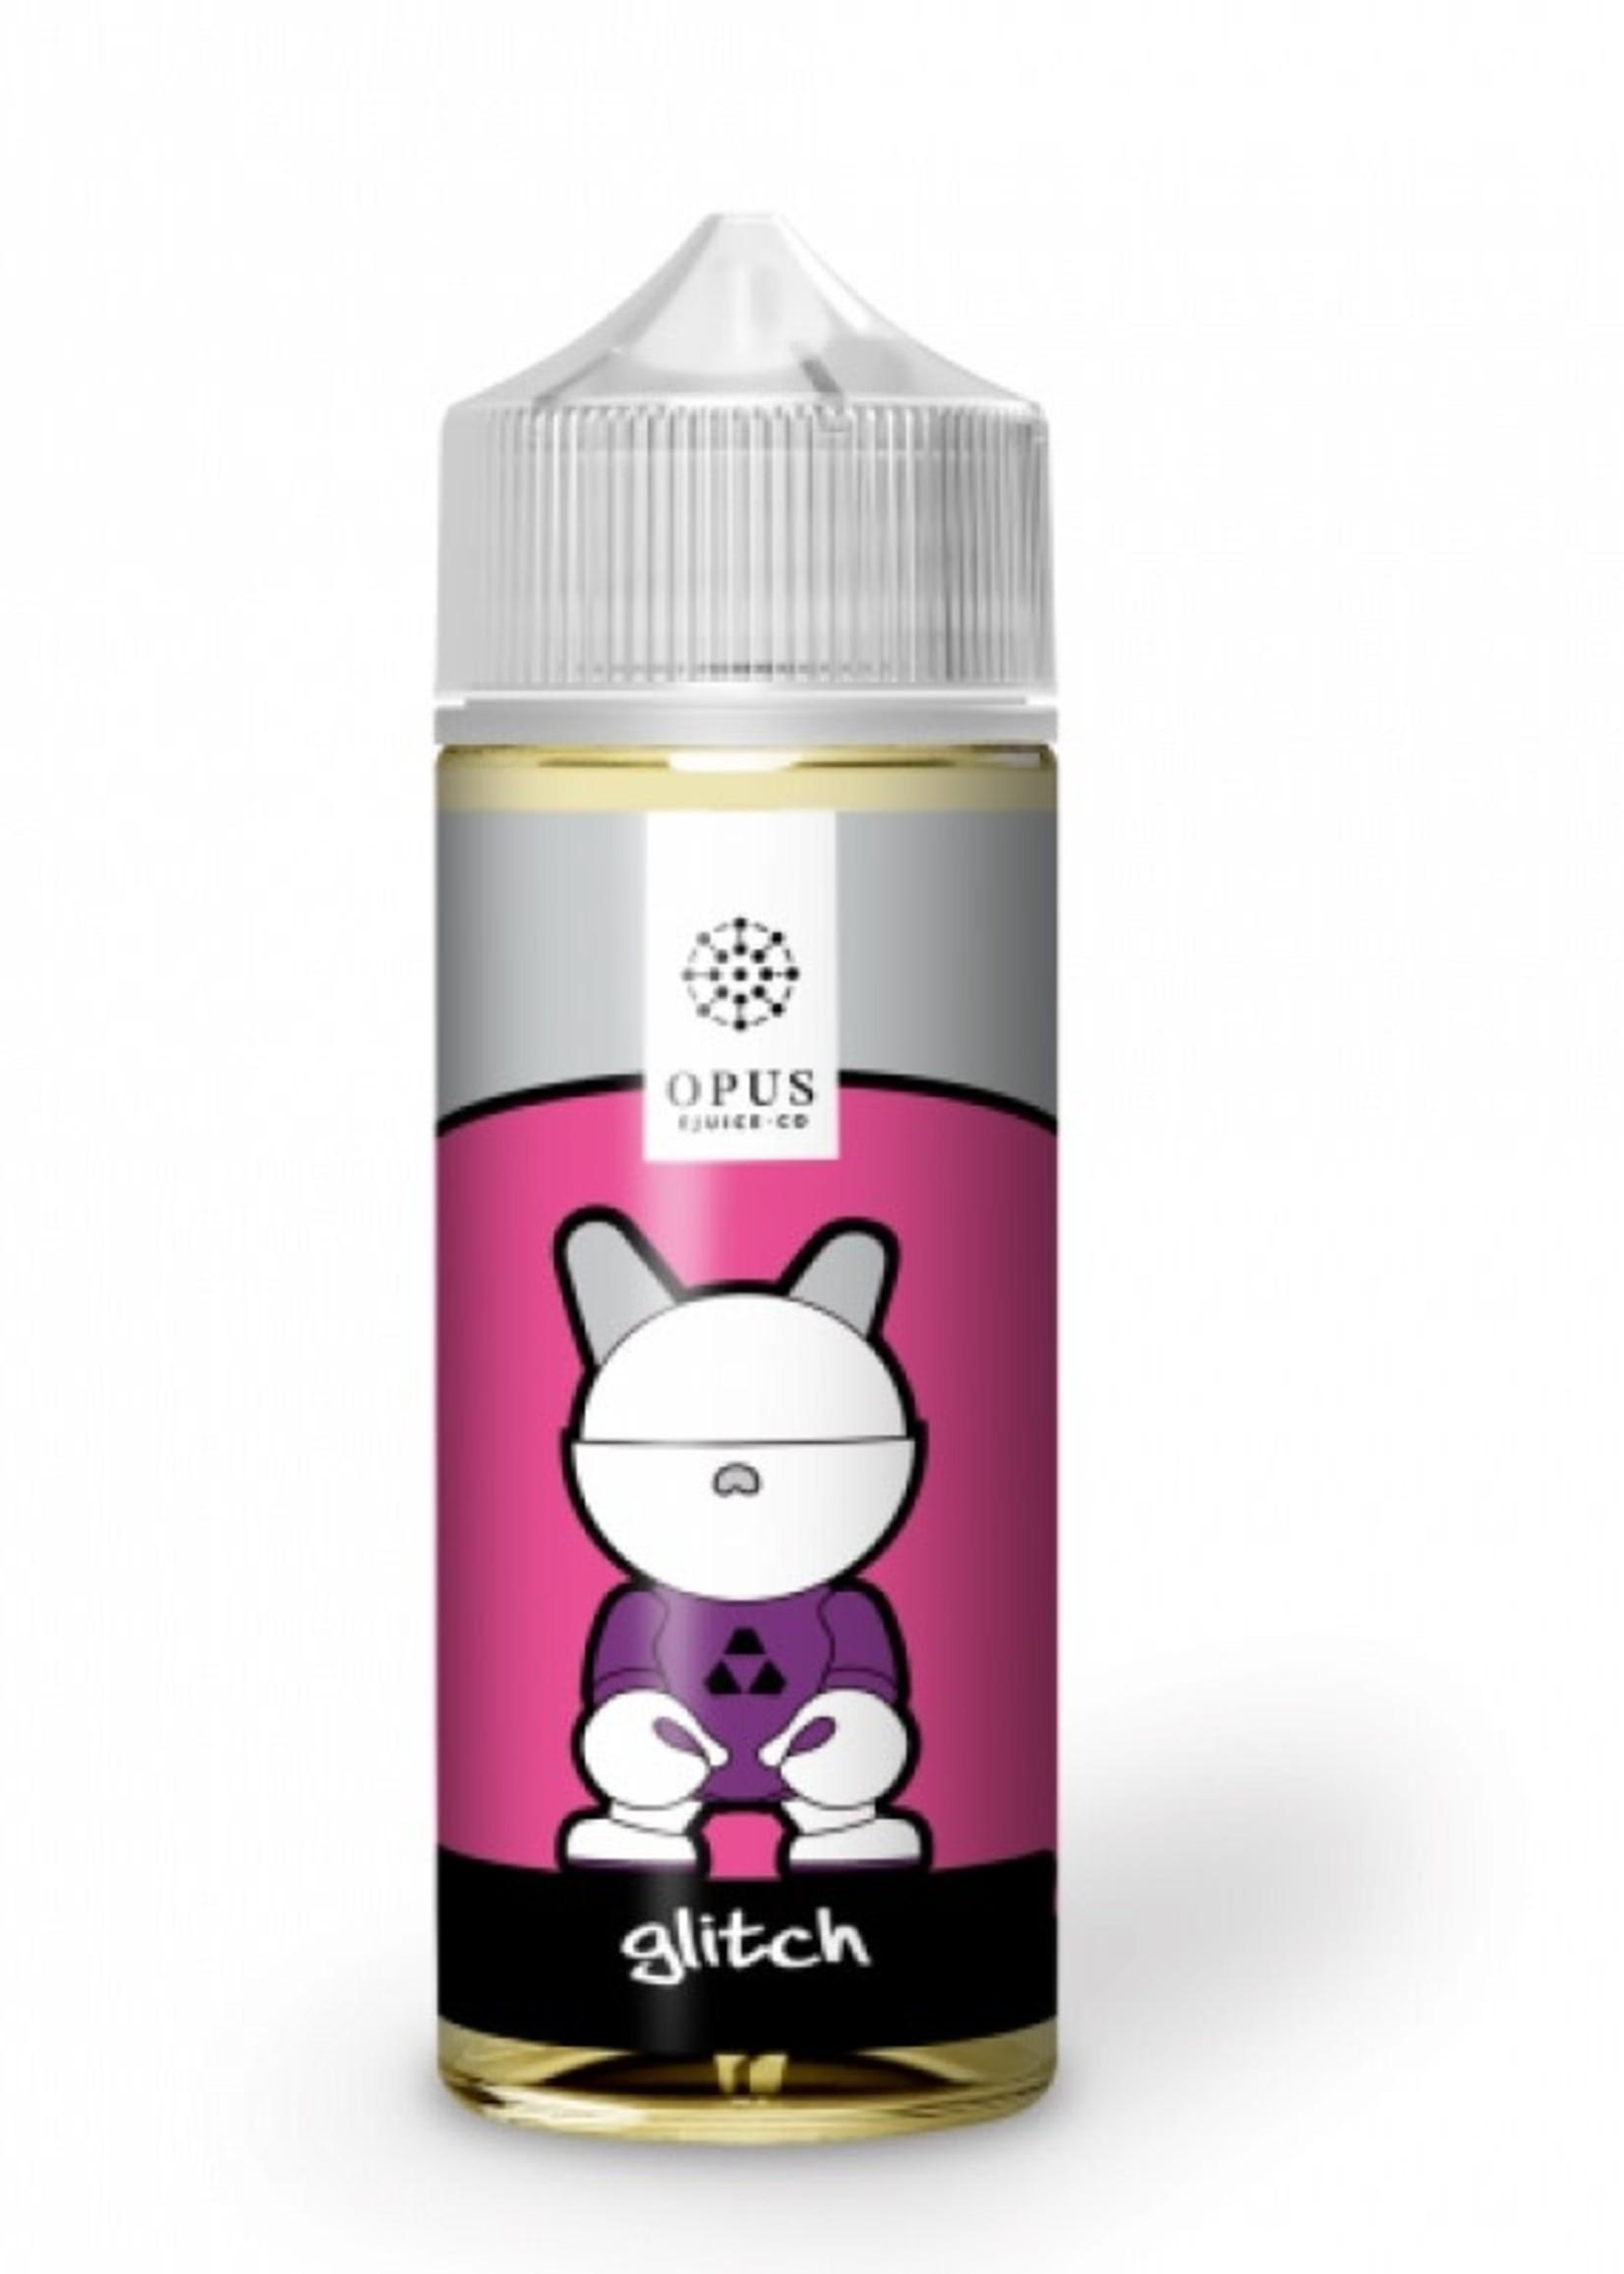 Opus Vape flavour - Glitch MTL 30ml- 12mg